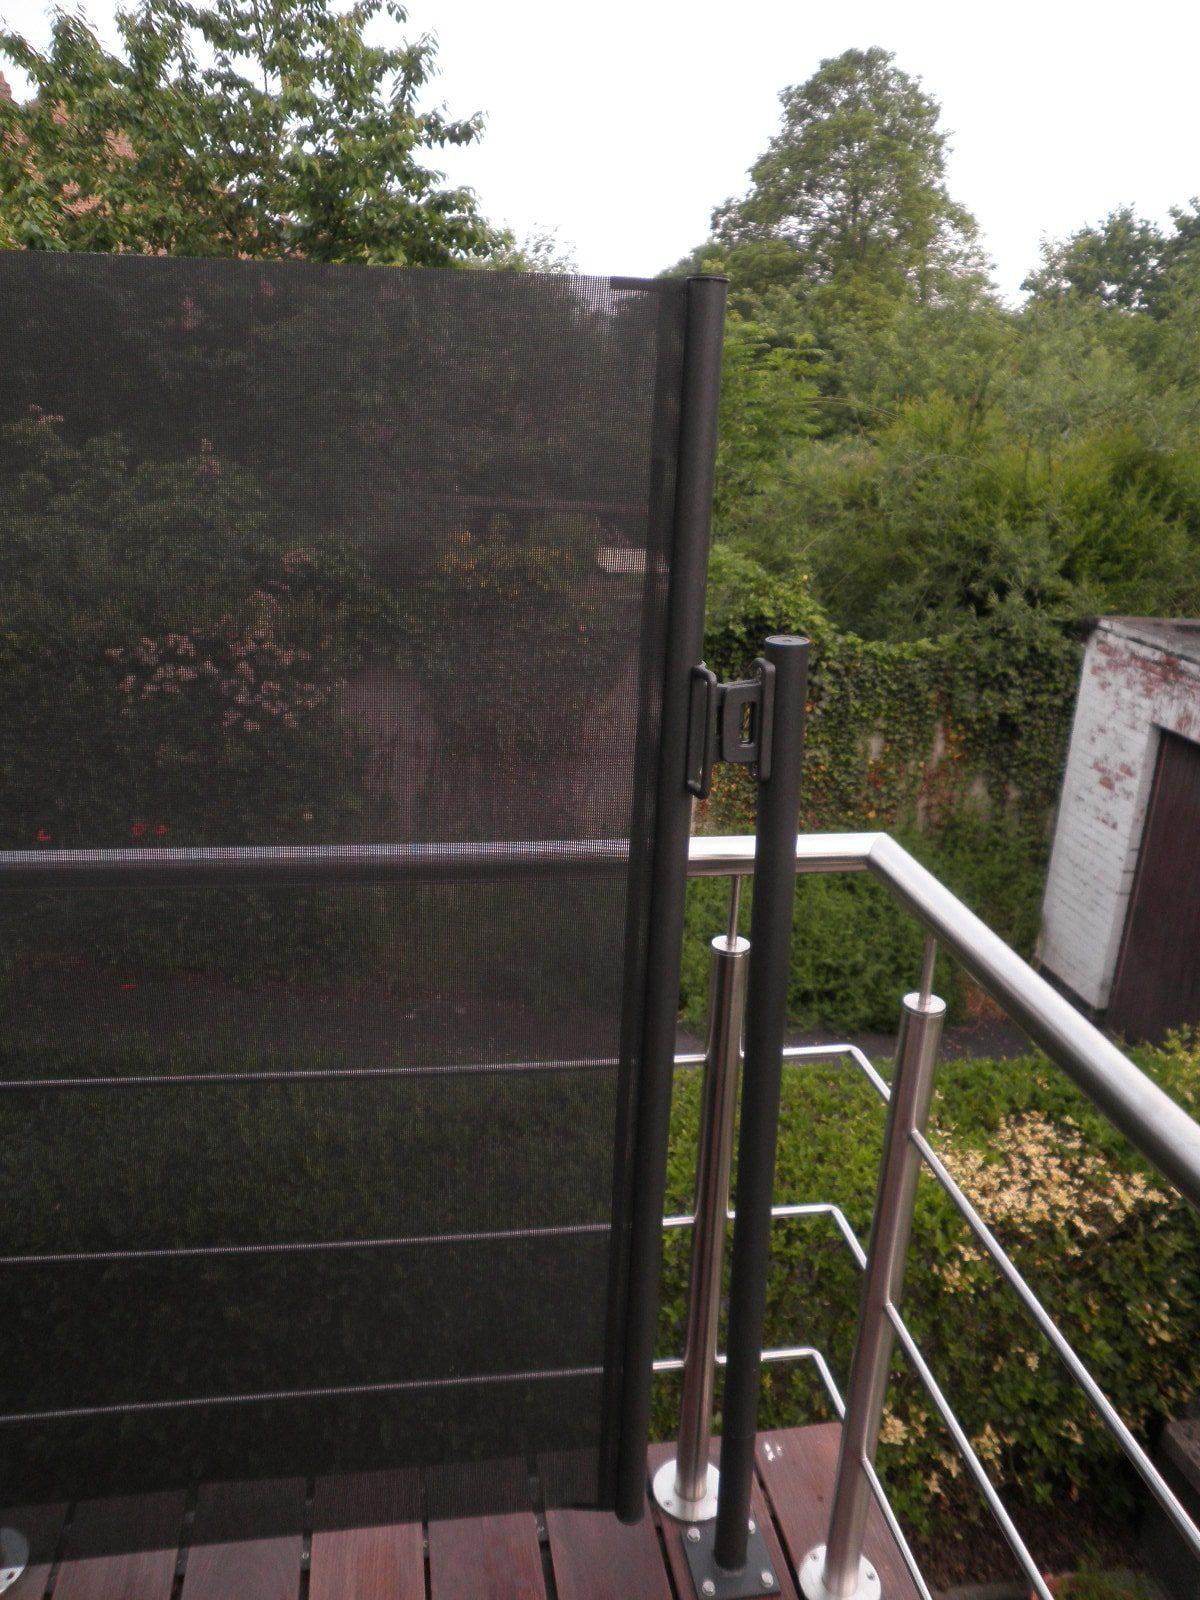 Windscherm op balkon - met eindmast.